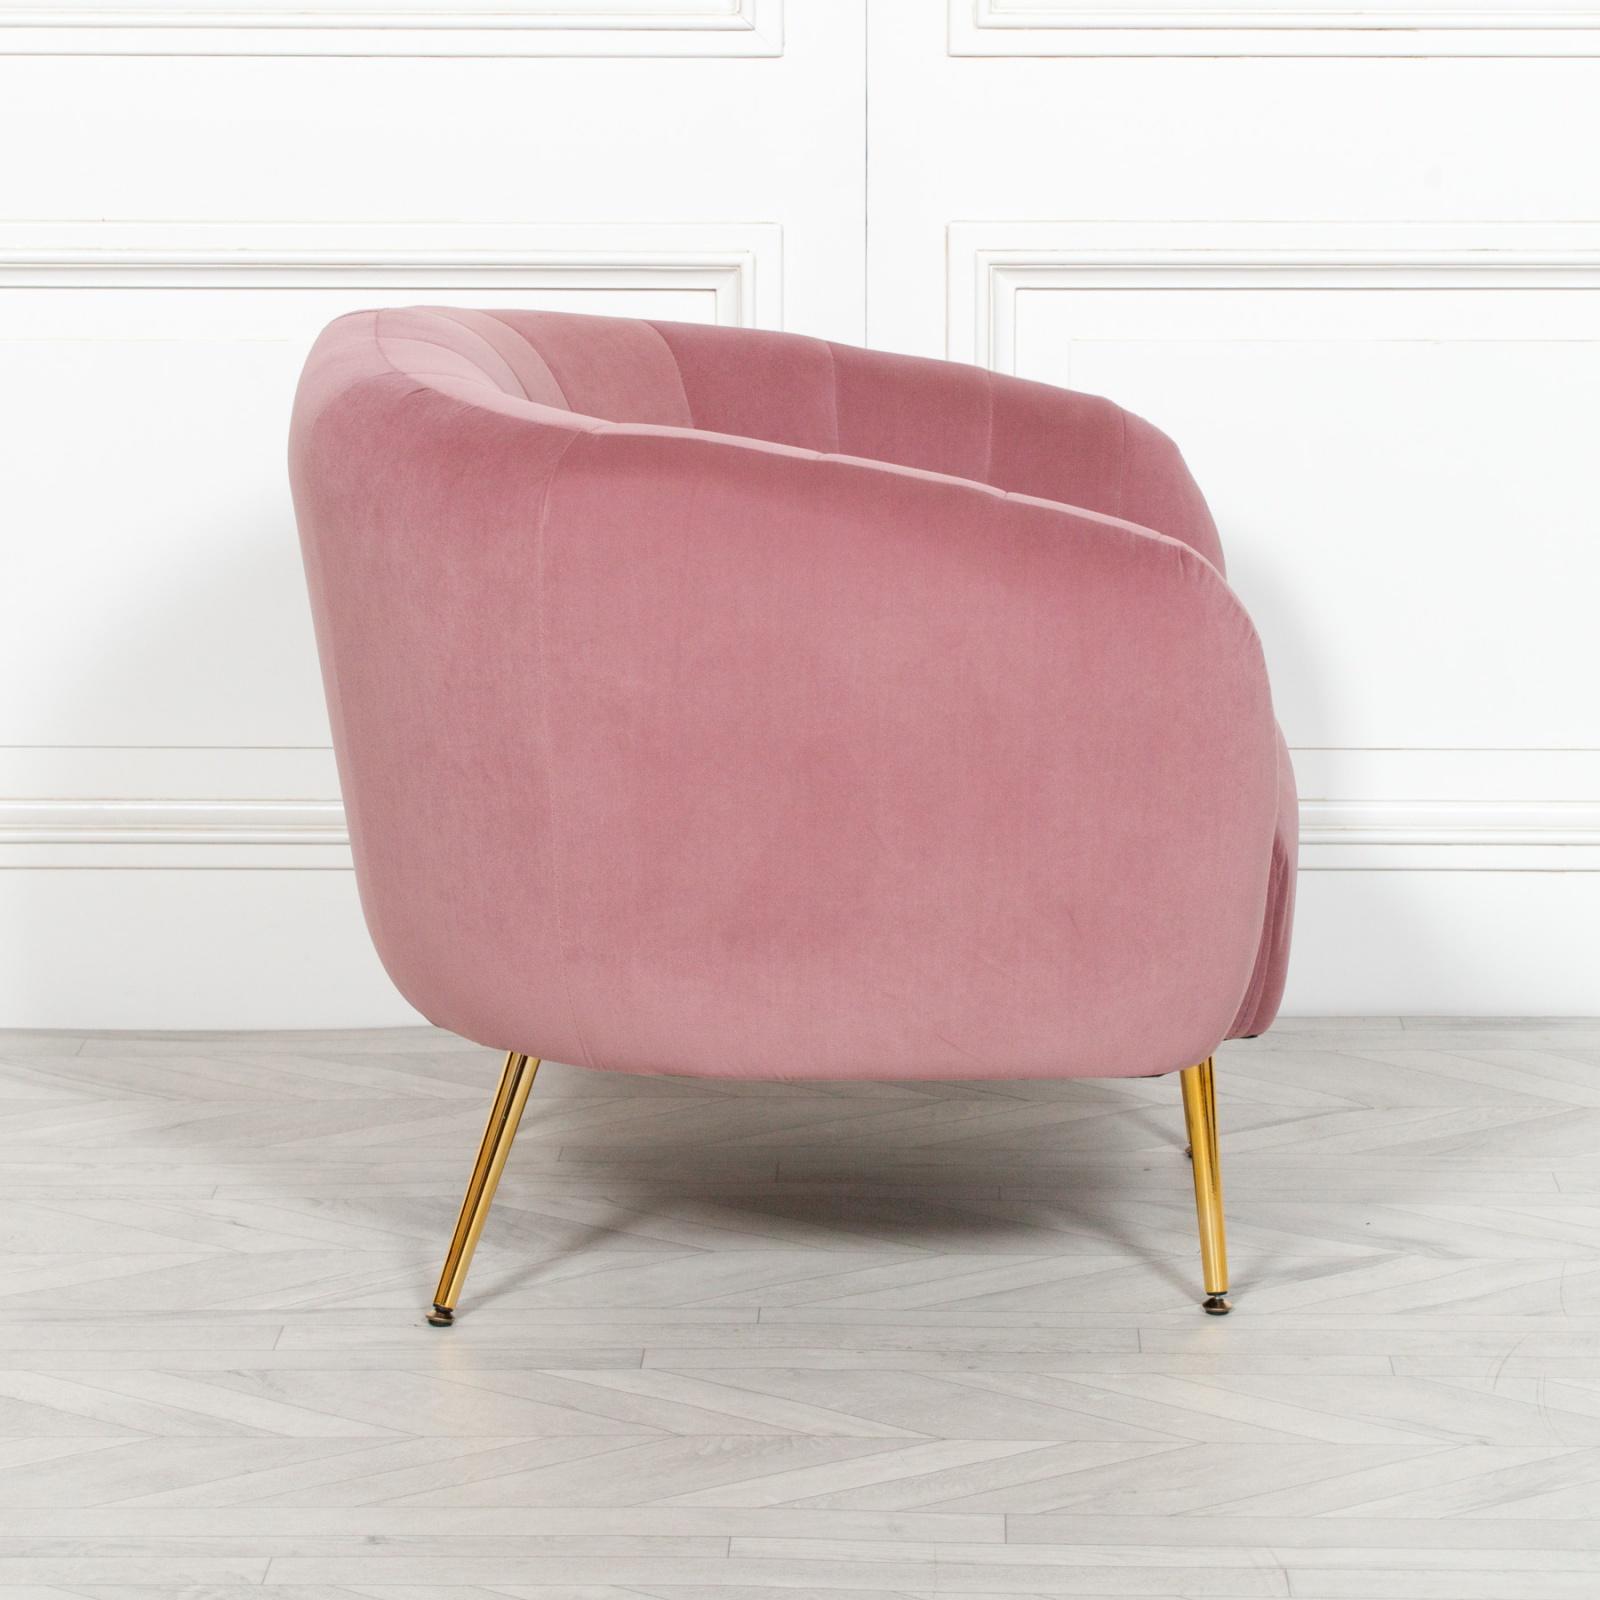 Adeline Pink Velvet Tub Armchair Furniture - La Maison ...